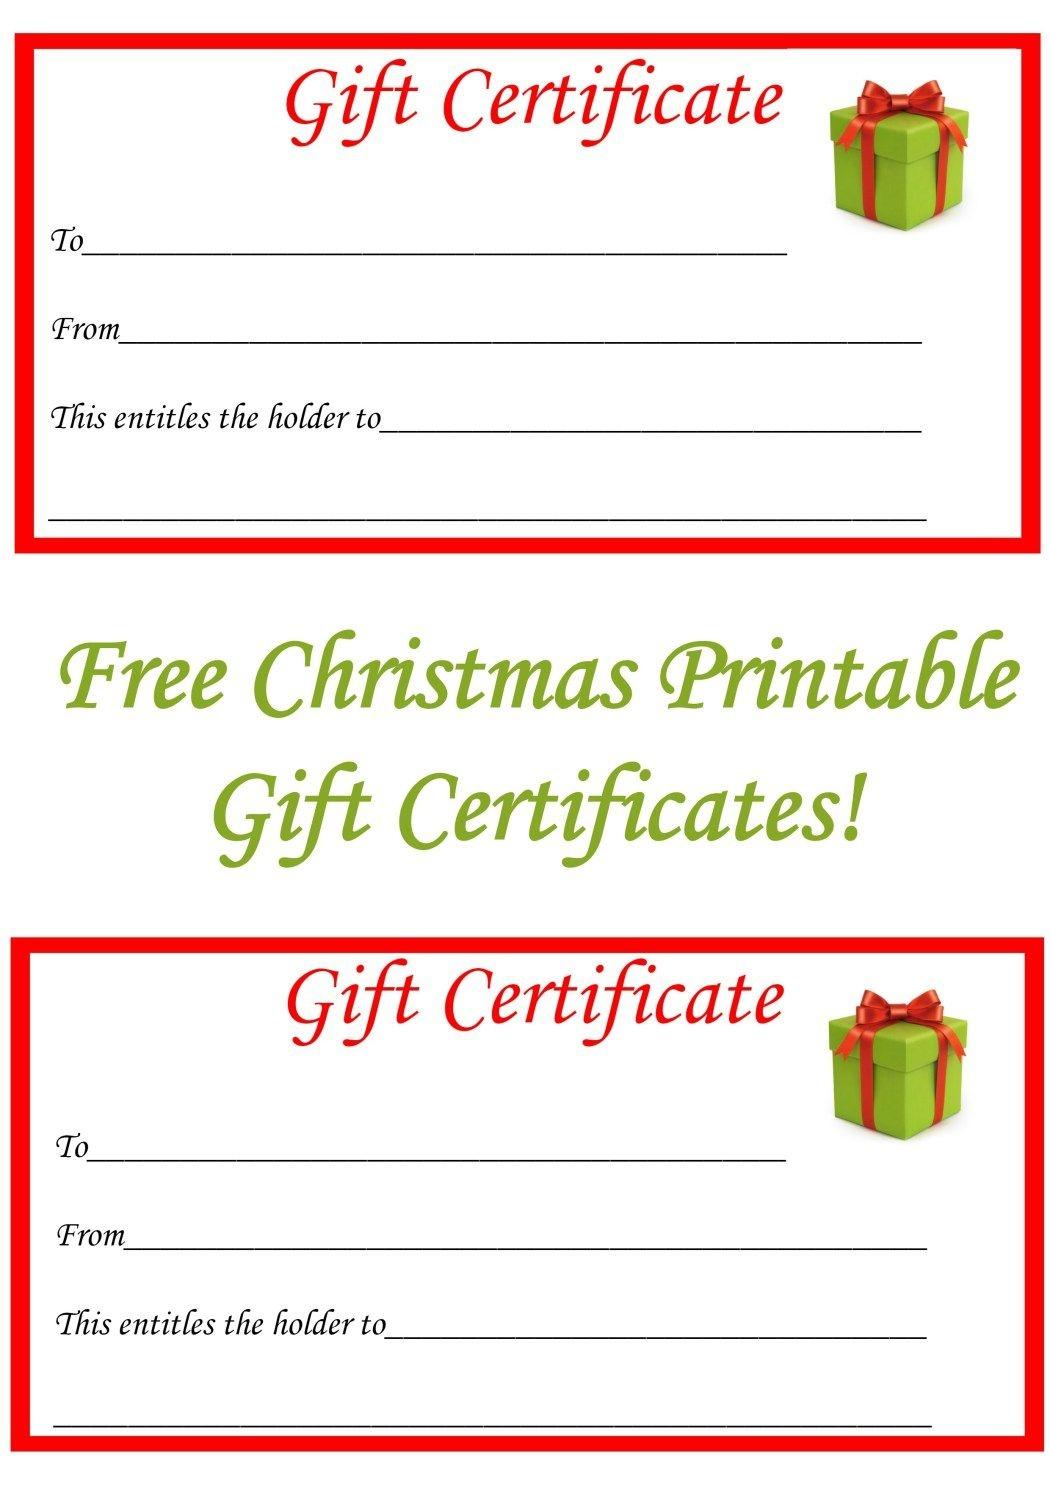 Free Christmas Printable Gift Certificates | Gift Ideas | Christmas - Free Printable Xmas Gift Certificates